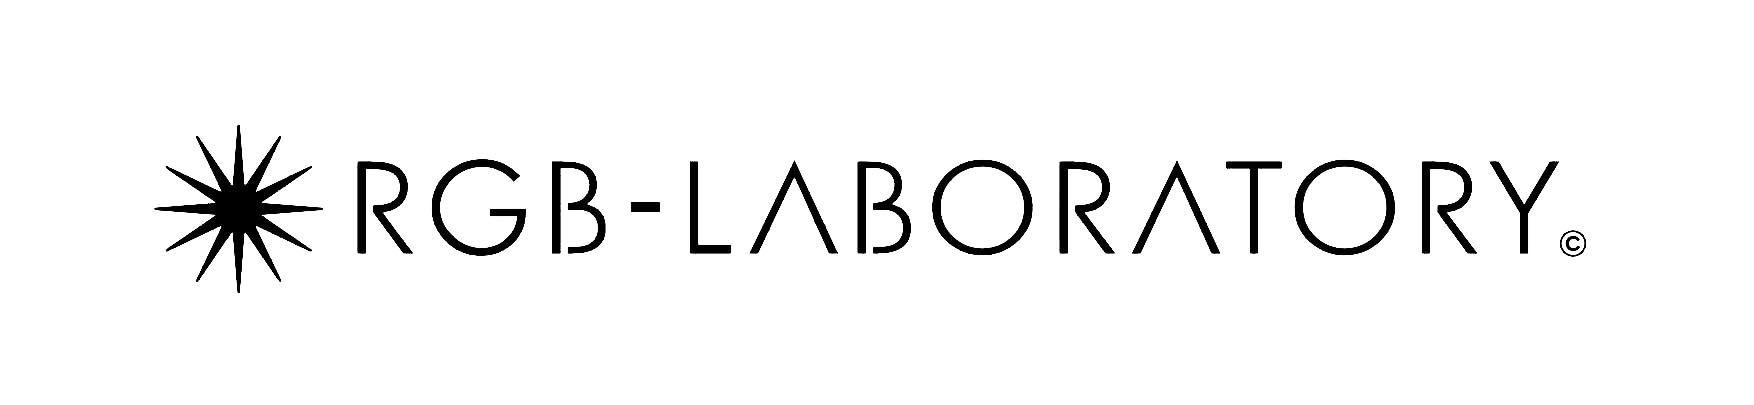 RGB-LABORATORY